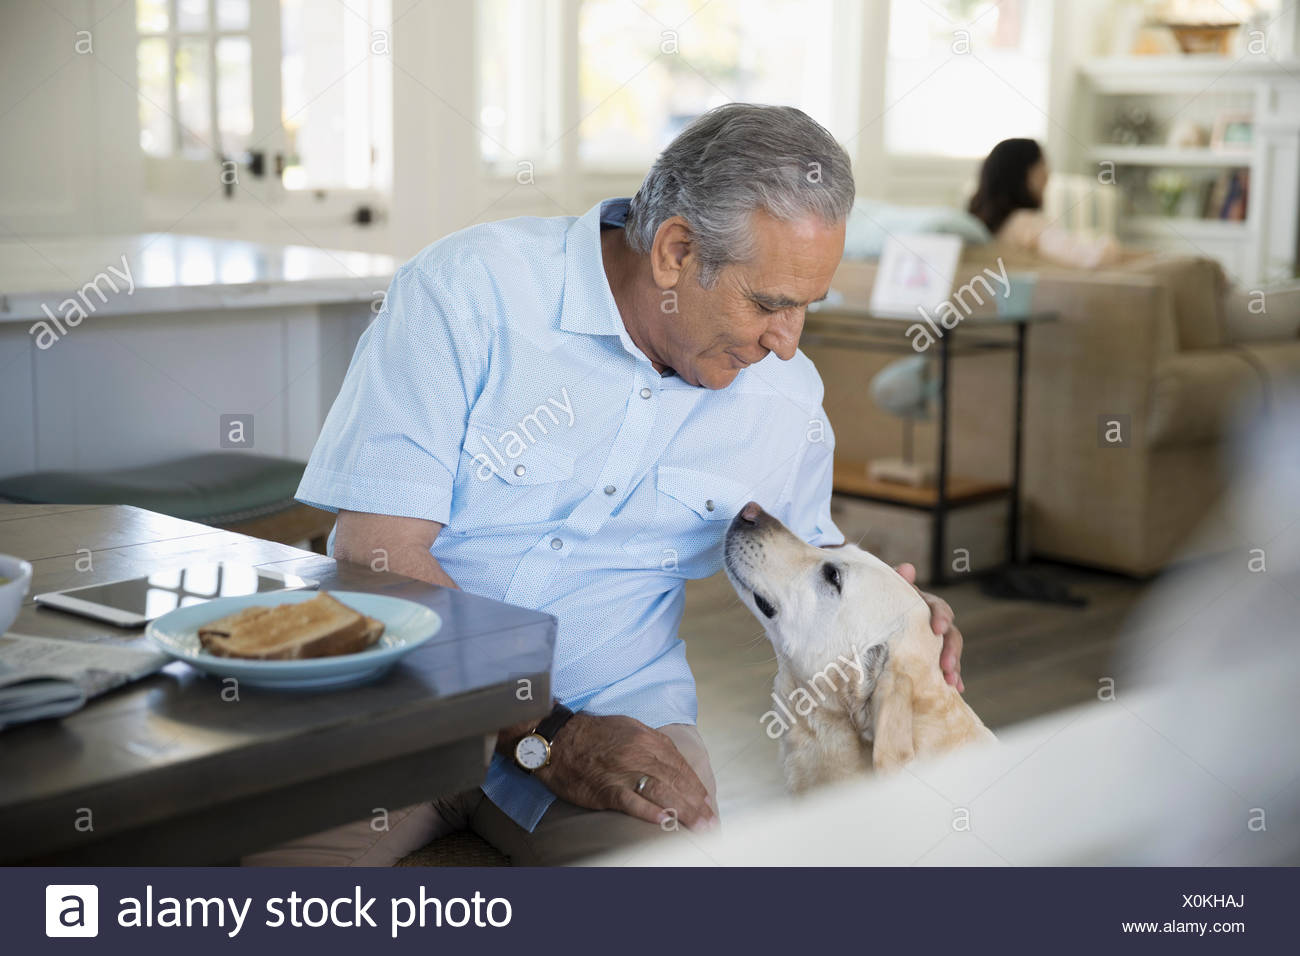 Senior man petting dog at breakfast table - Stock Image